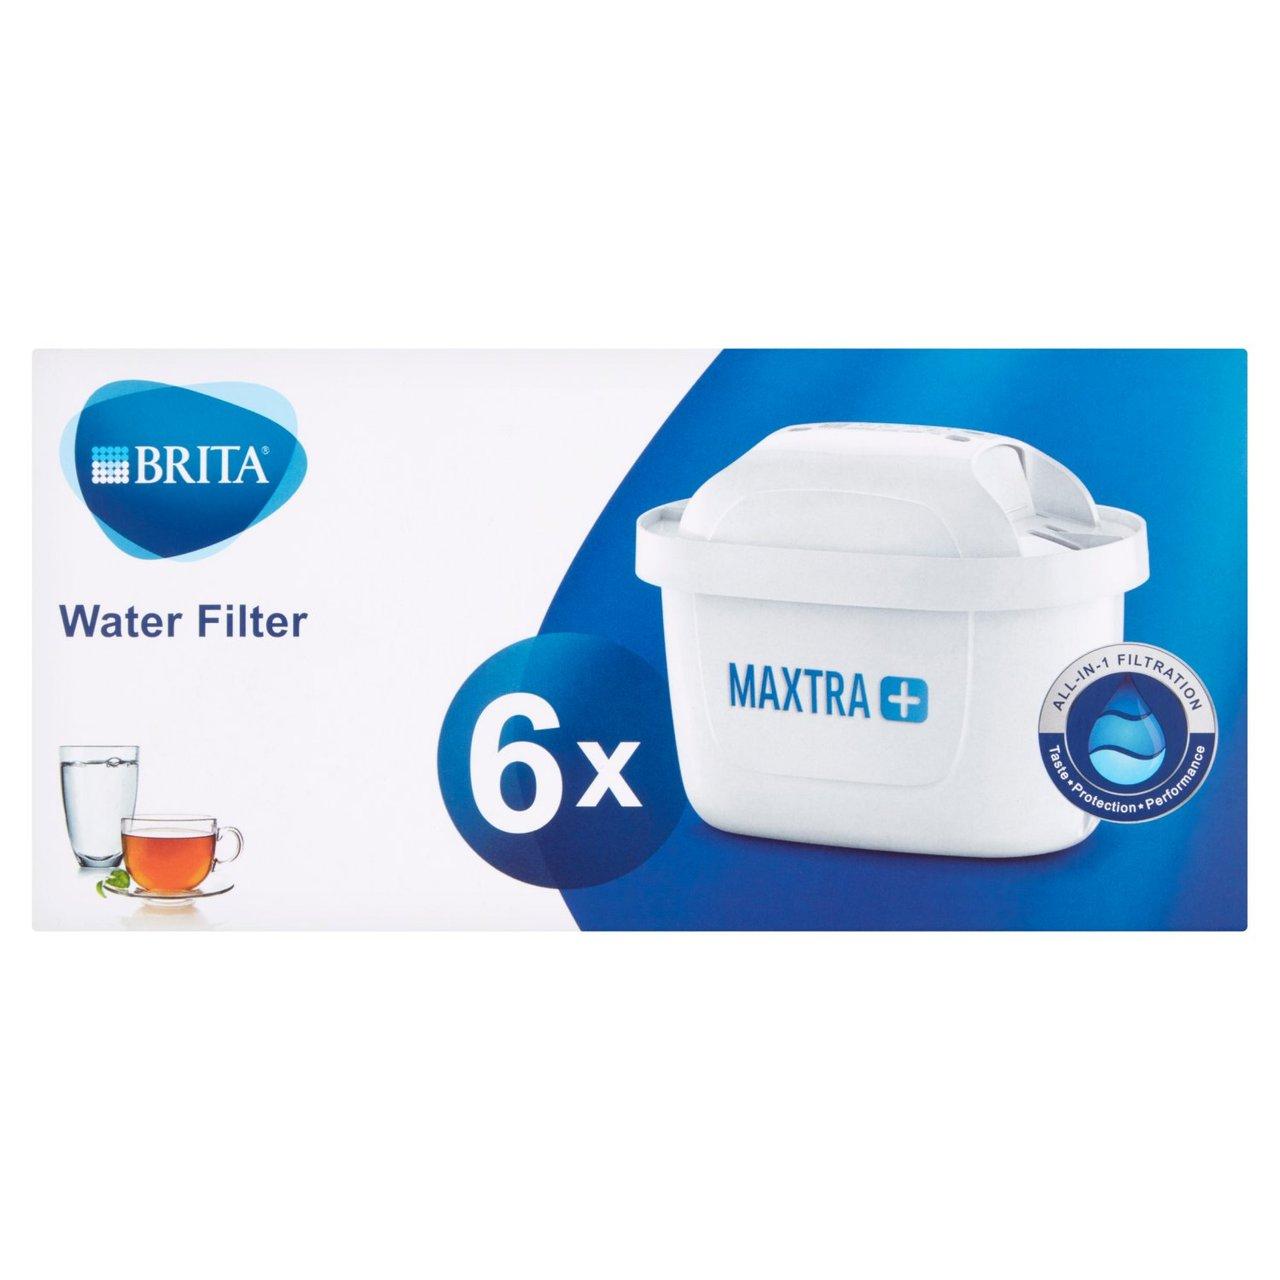 BRITA MAXTRA+ water filter cartridges 6 per pack - £20.00 @ Morrisons